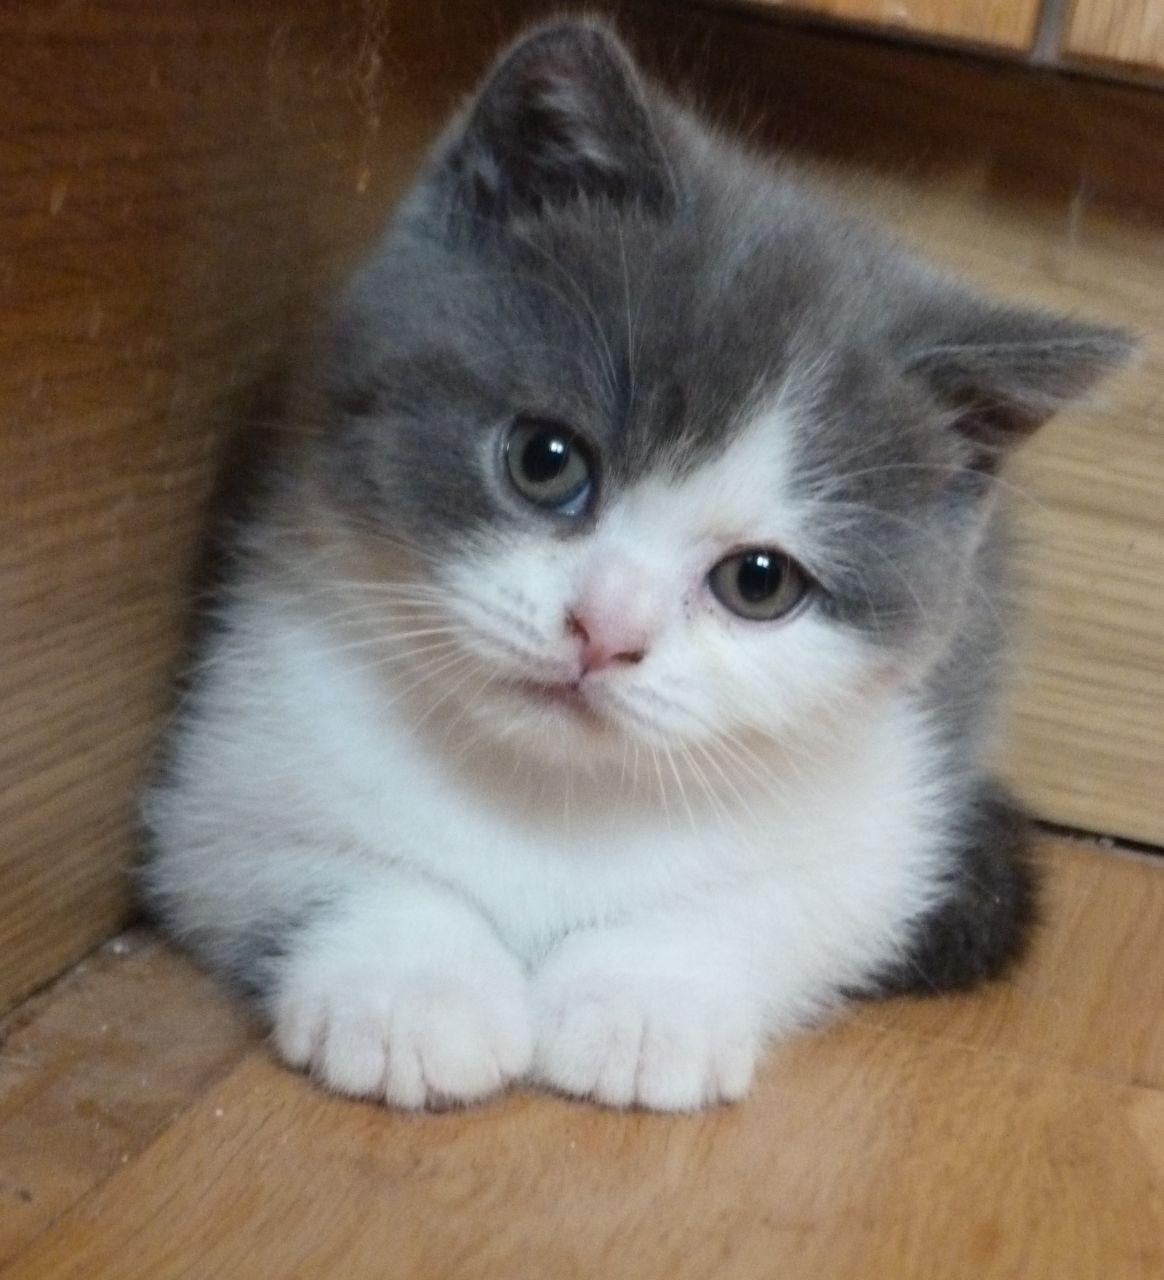 British Shorthair Kittens Cute Image 6600 Kittens Cutest Cute Baby Animals Cute Cats